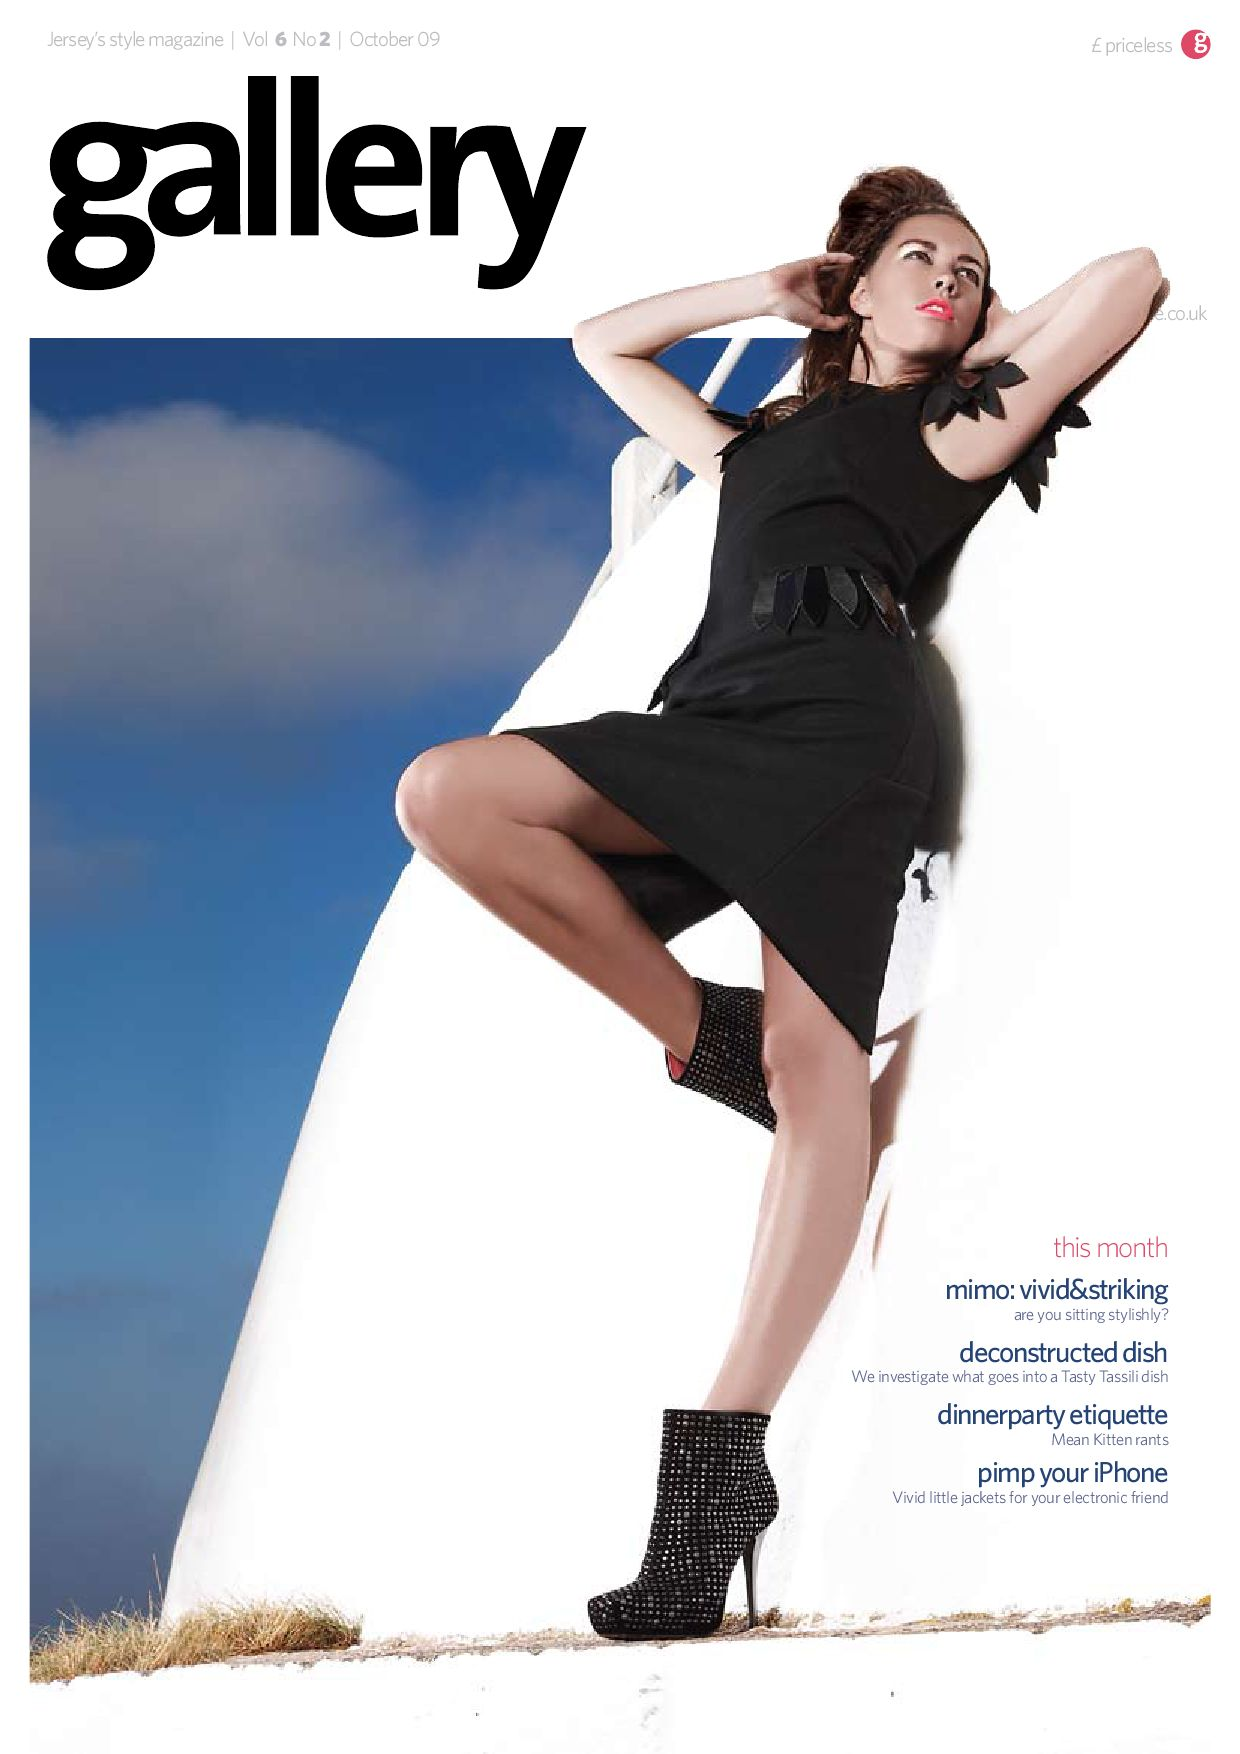 Luxe Dessin A Imprimer Hugo L'escargot Chat